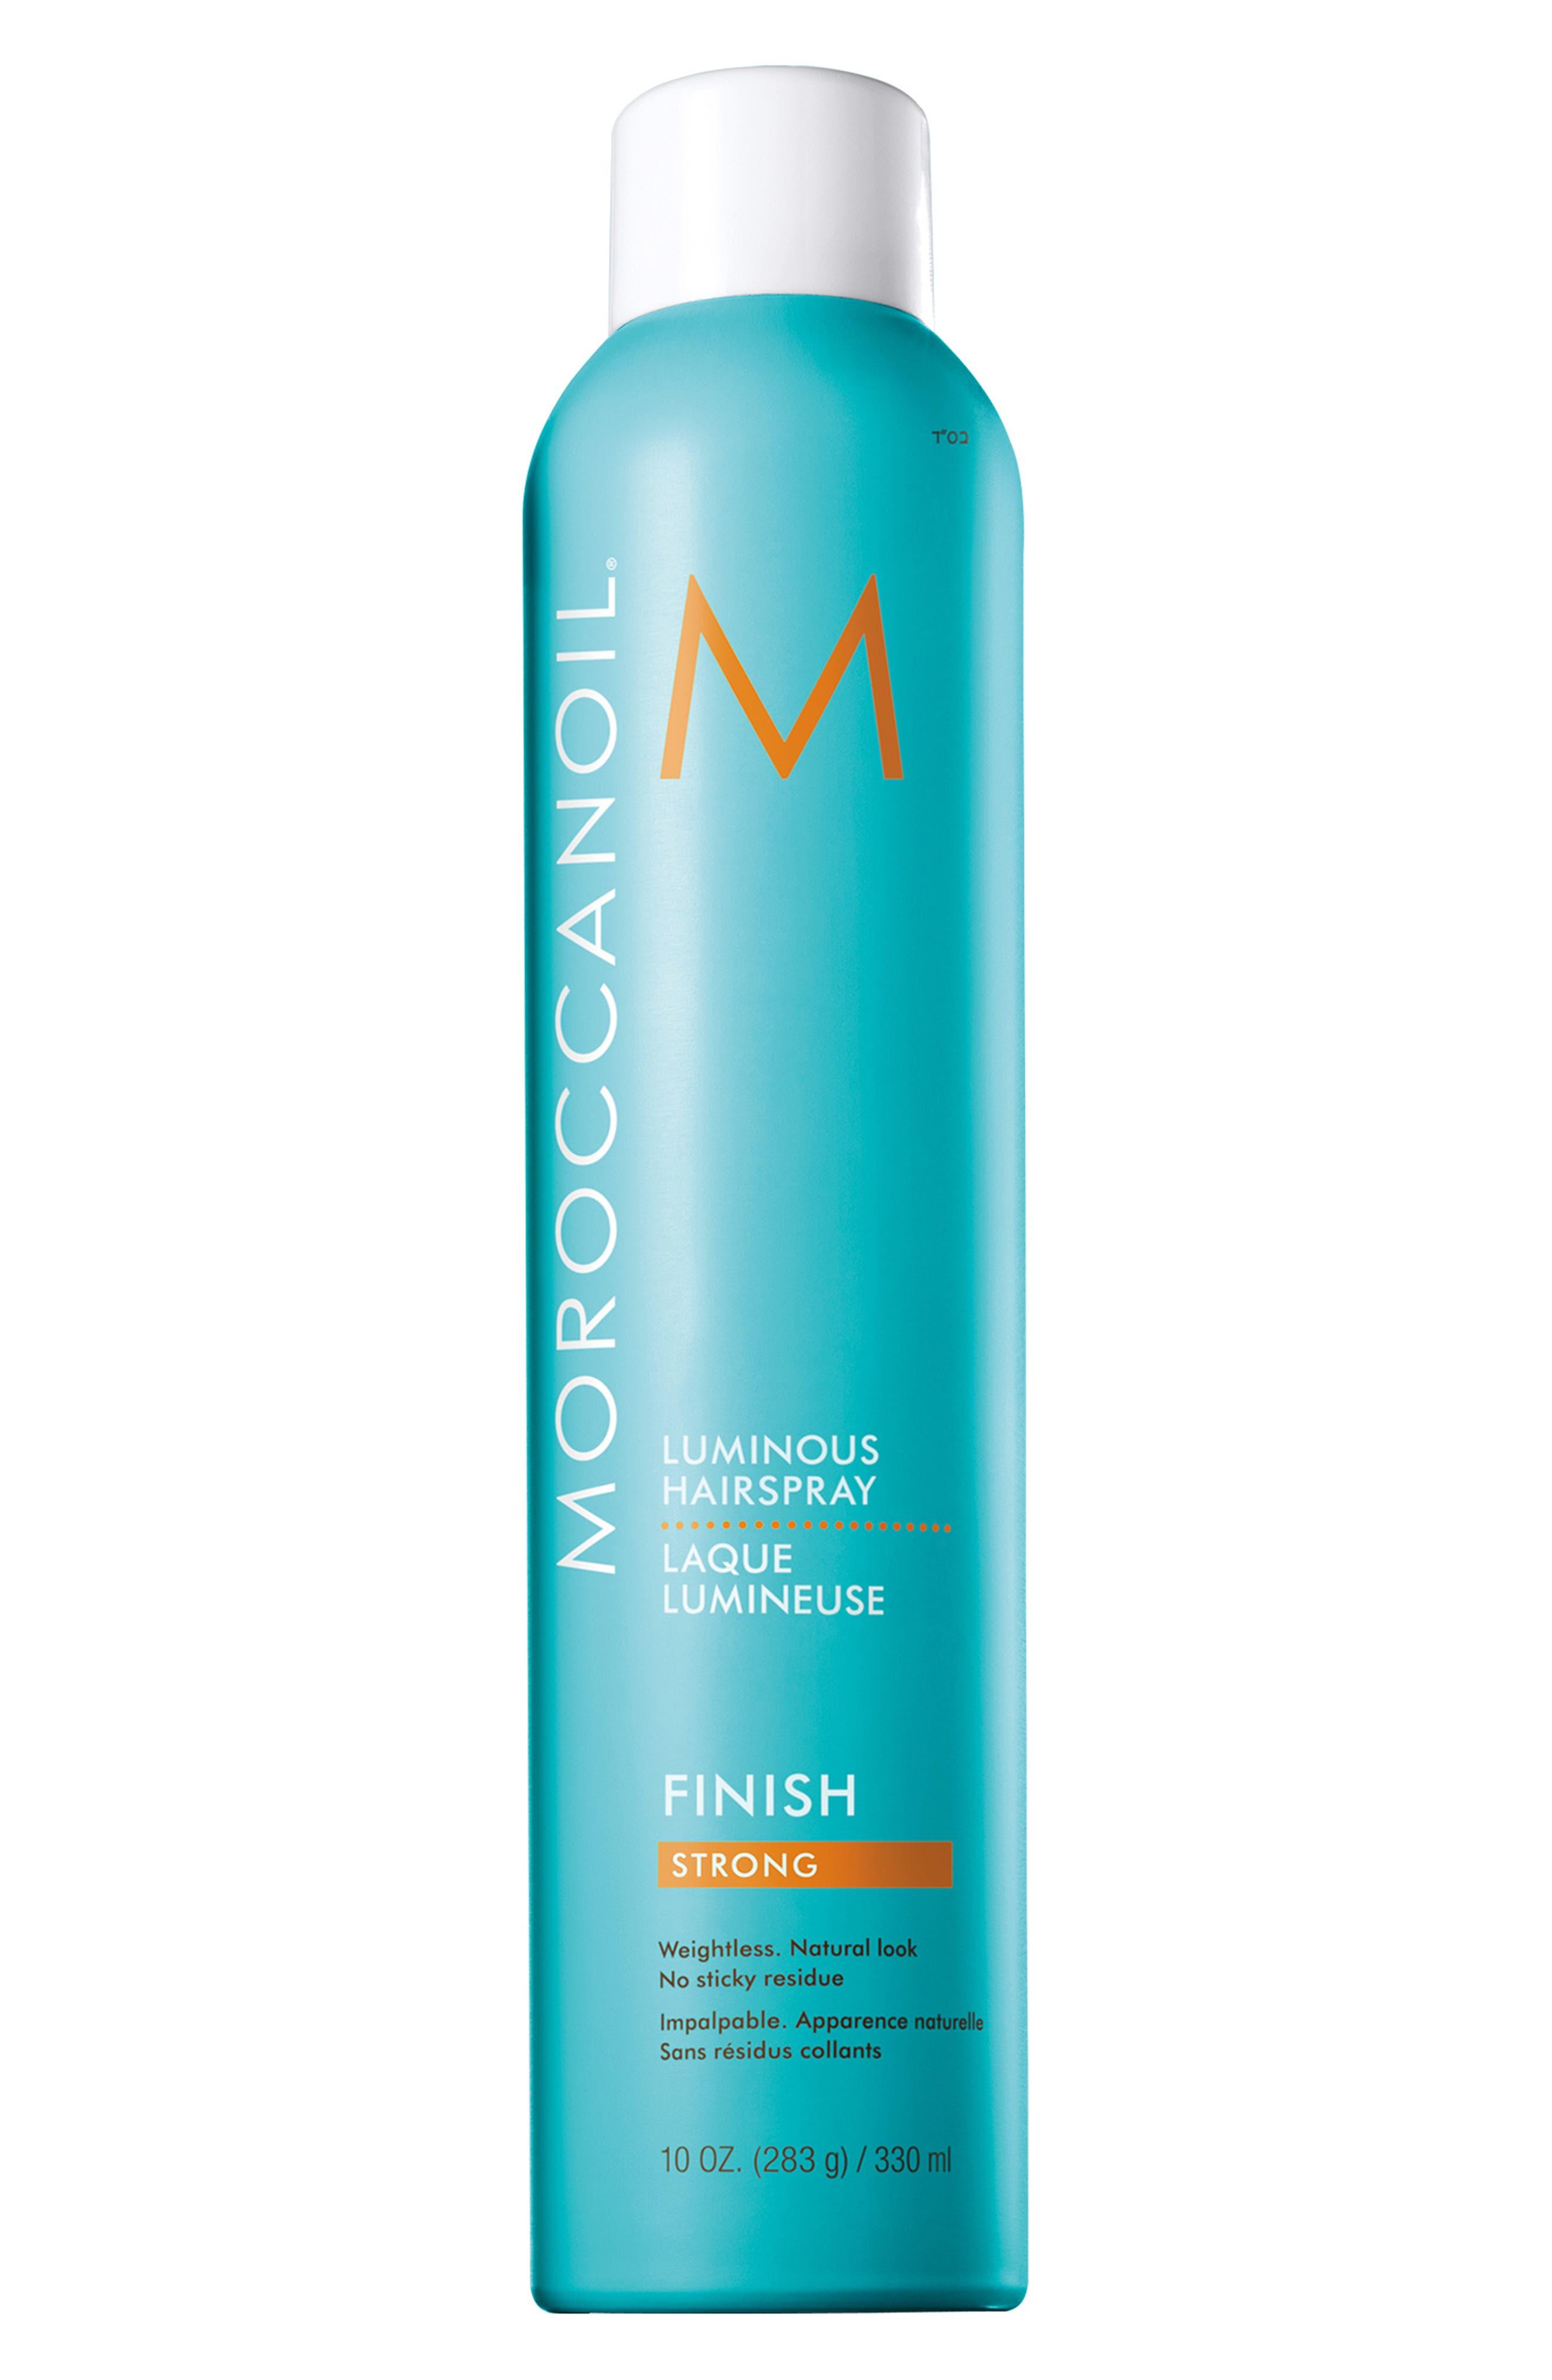 MOROCCANOIL 'Luminous' Hairspray Strong